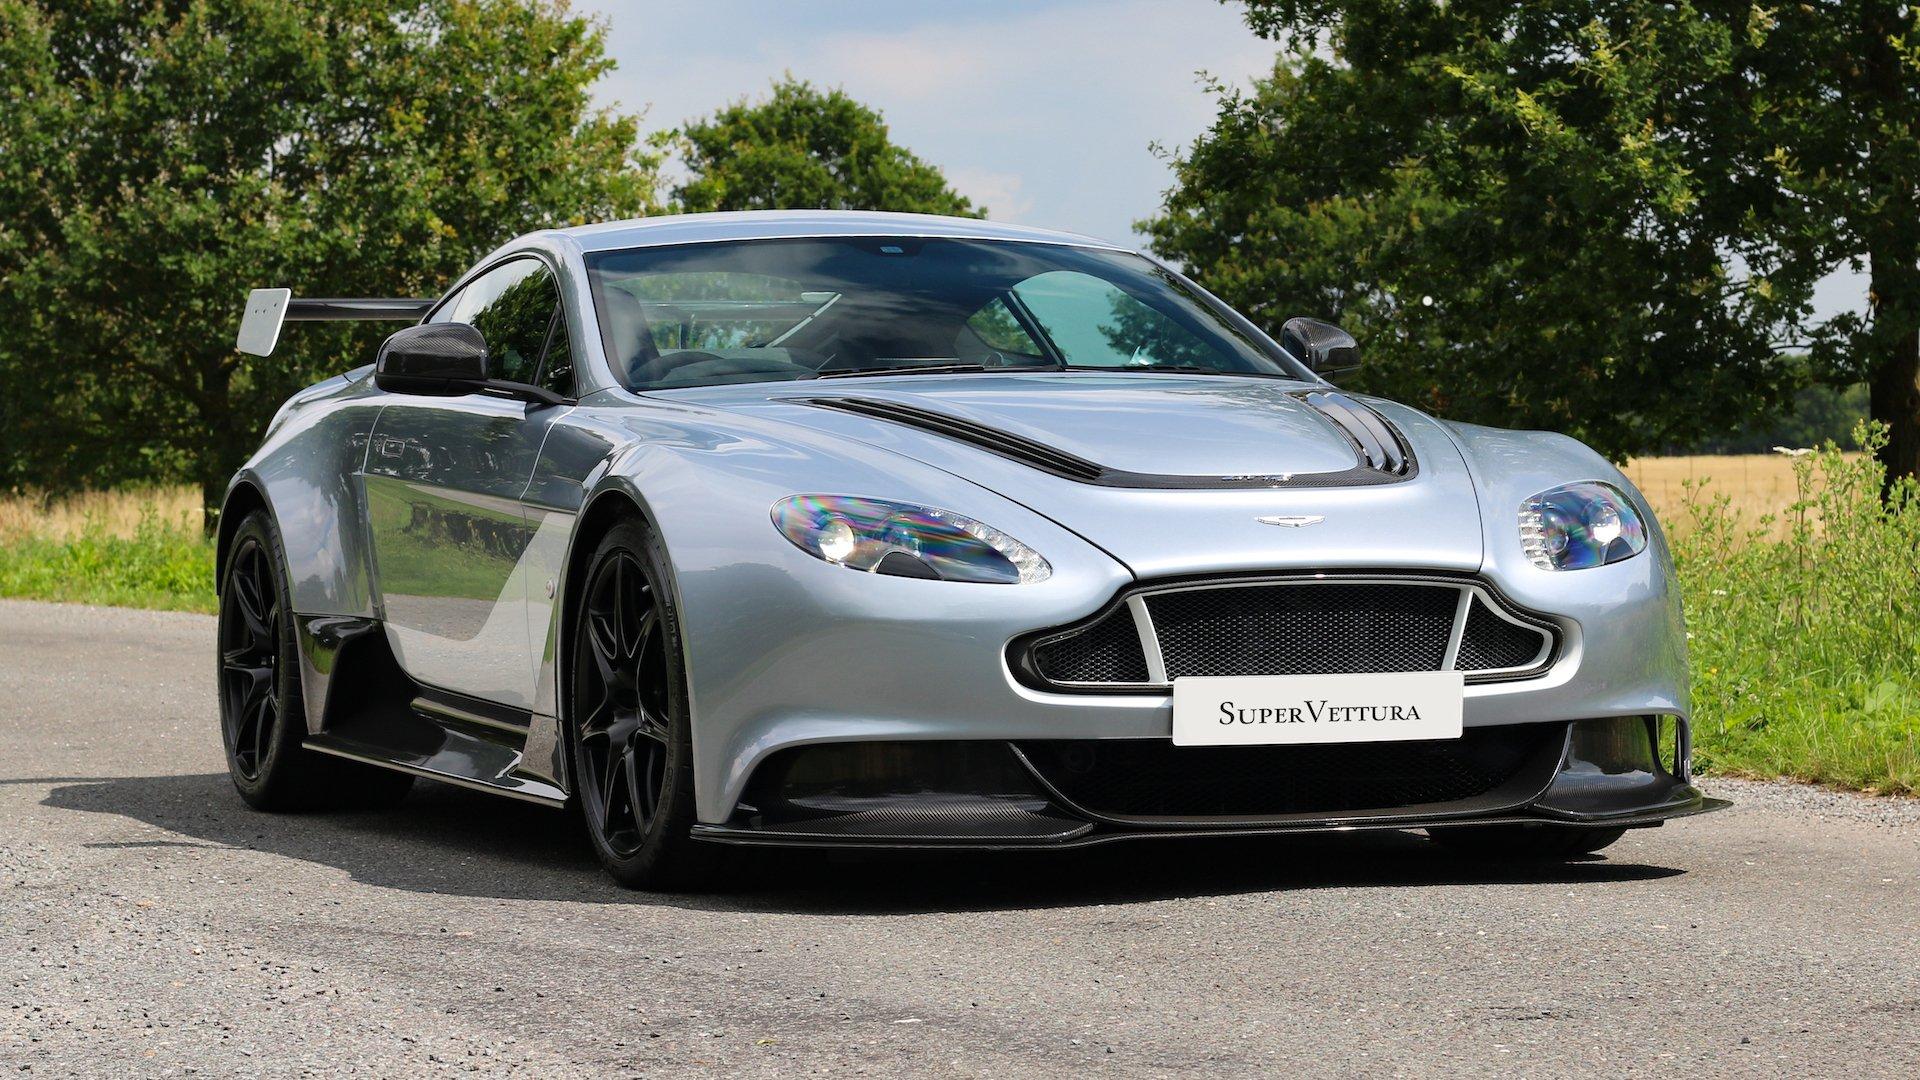 2015 Aston Martin Gt12 In Sunningdale England United Kingdom For Sale 10655032